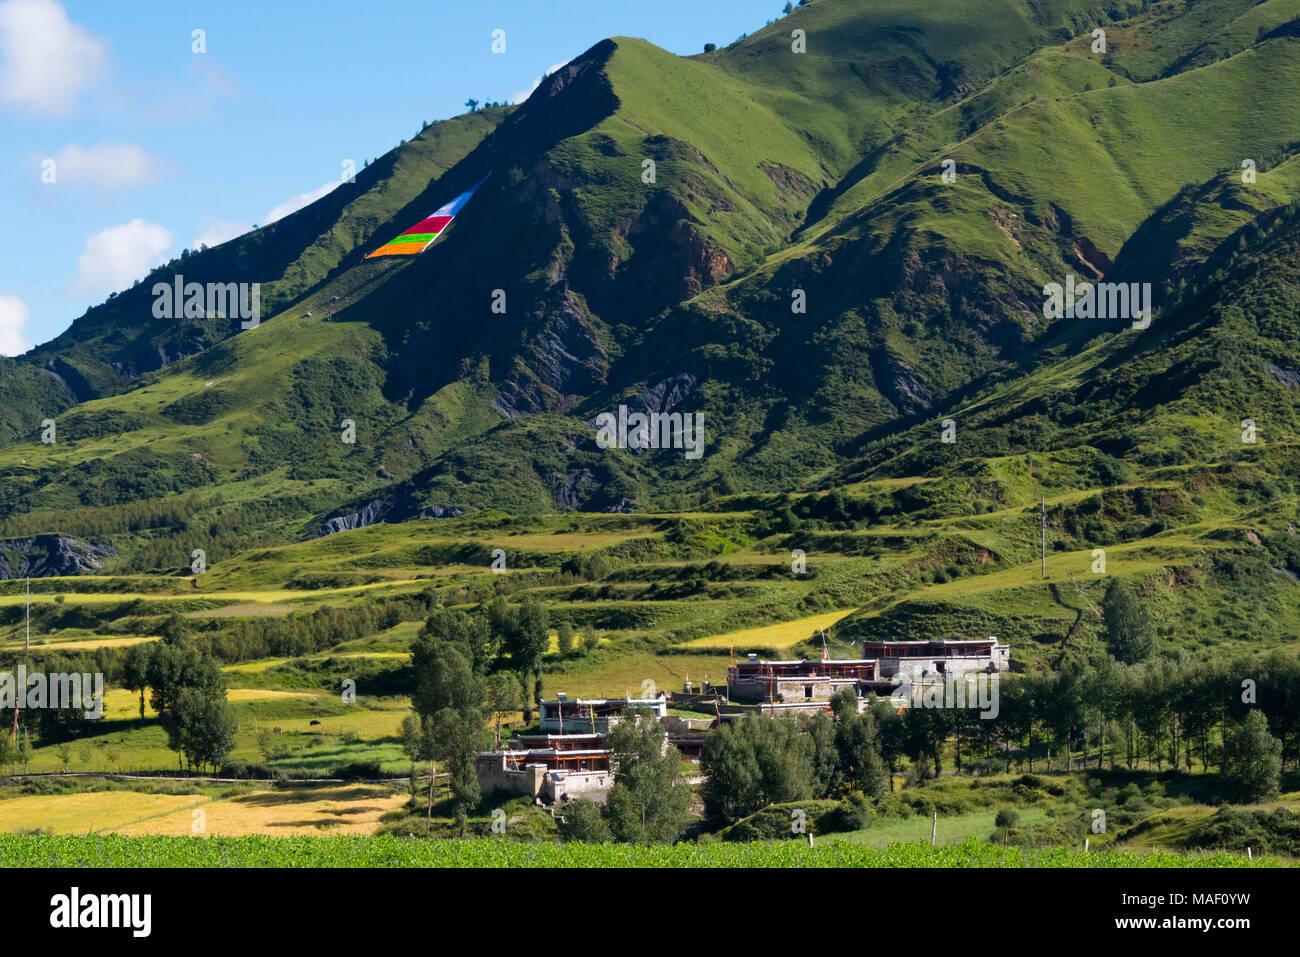 Praying flags on the hillside, Tibetan village house and farmland, Bamei, Garze Tibetan Autonomous Prefecture, western Sichuan, China Stock Photo